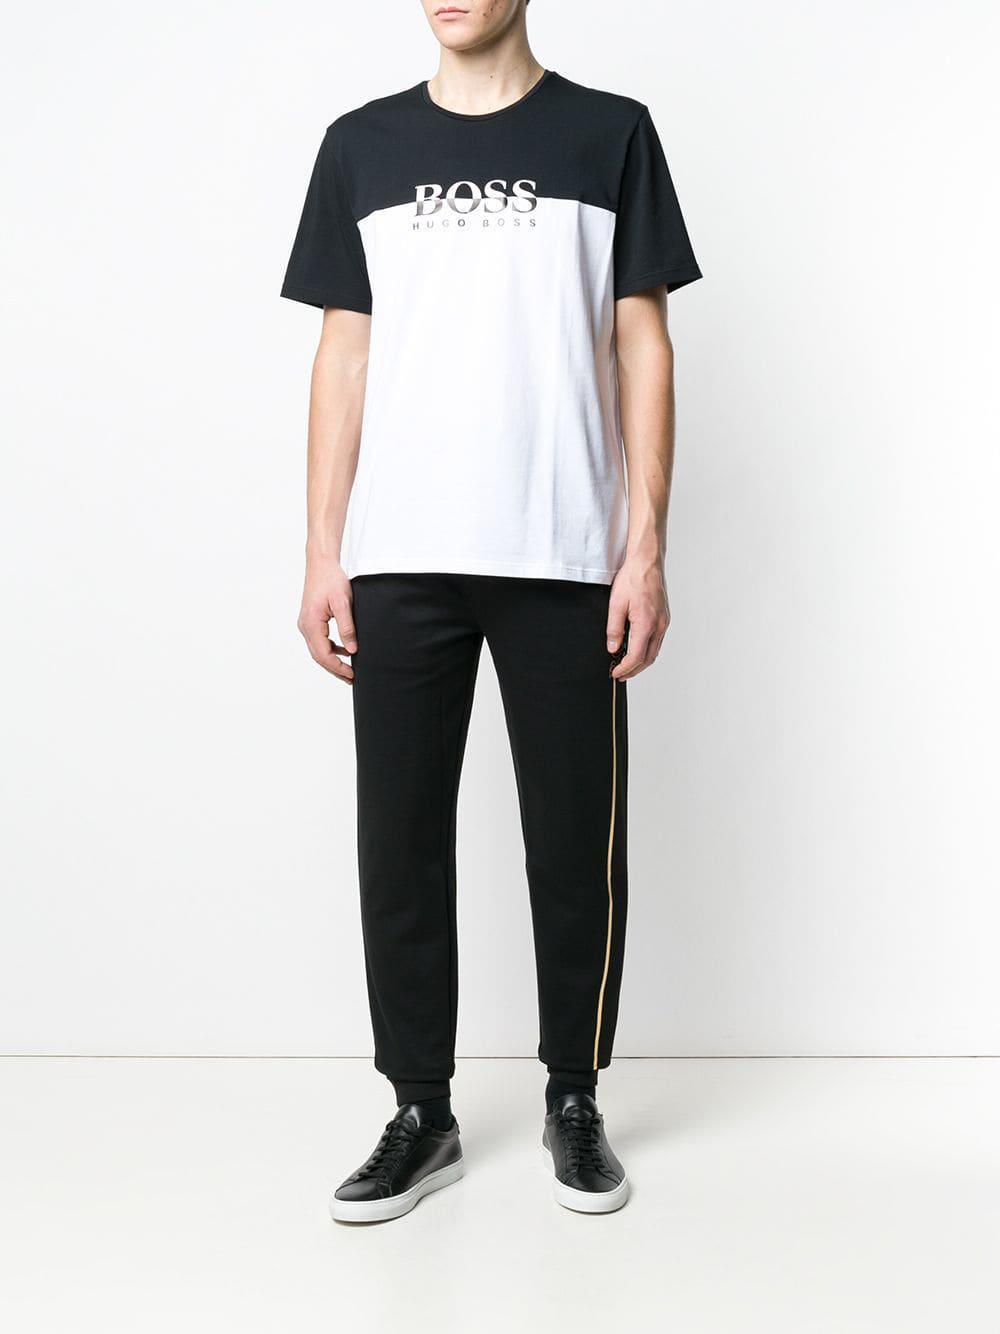 9c39853a BOSS Colour Block Logo T-shirt in Black for Men - Lyst